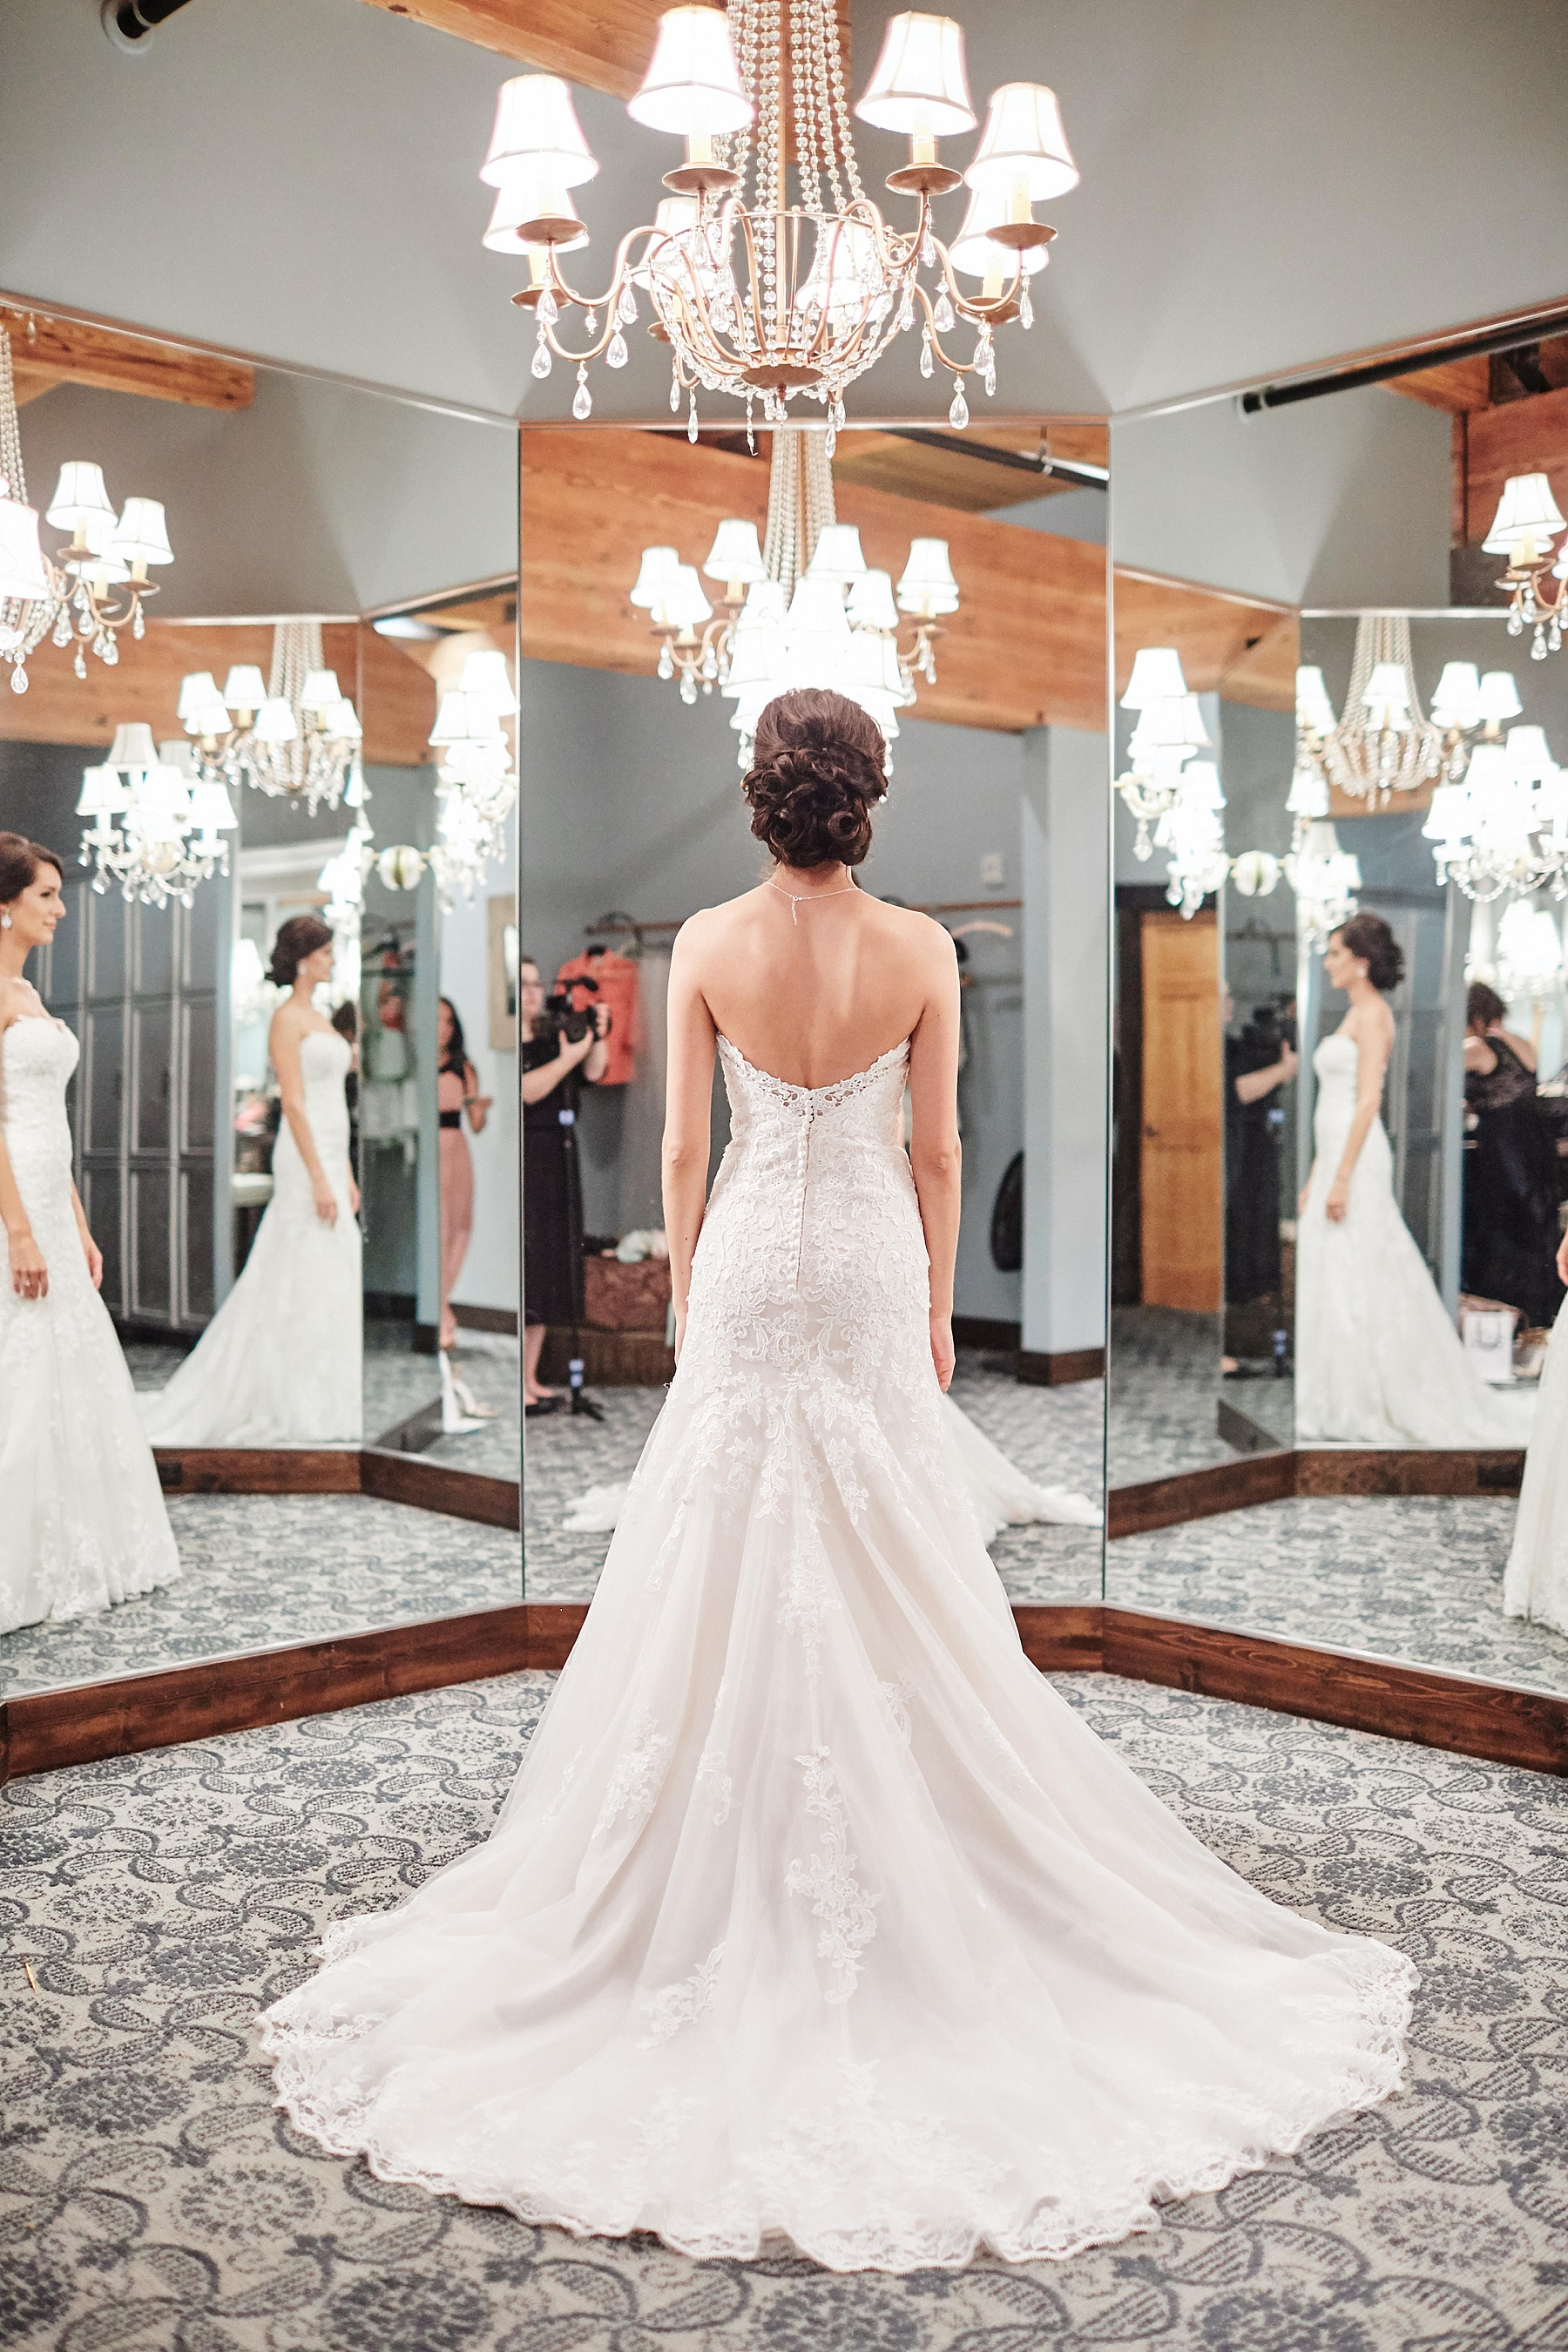 ABULAE-Wedding-Saint-paul-MN-Josh-Sofia-Wedding-Mears-Park_0732.jpg